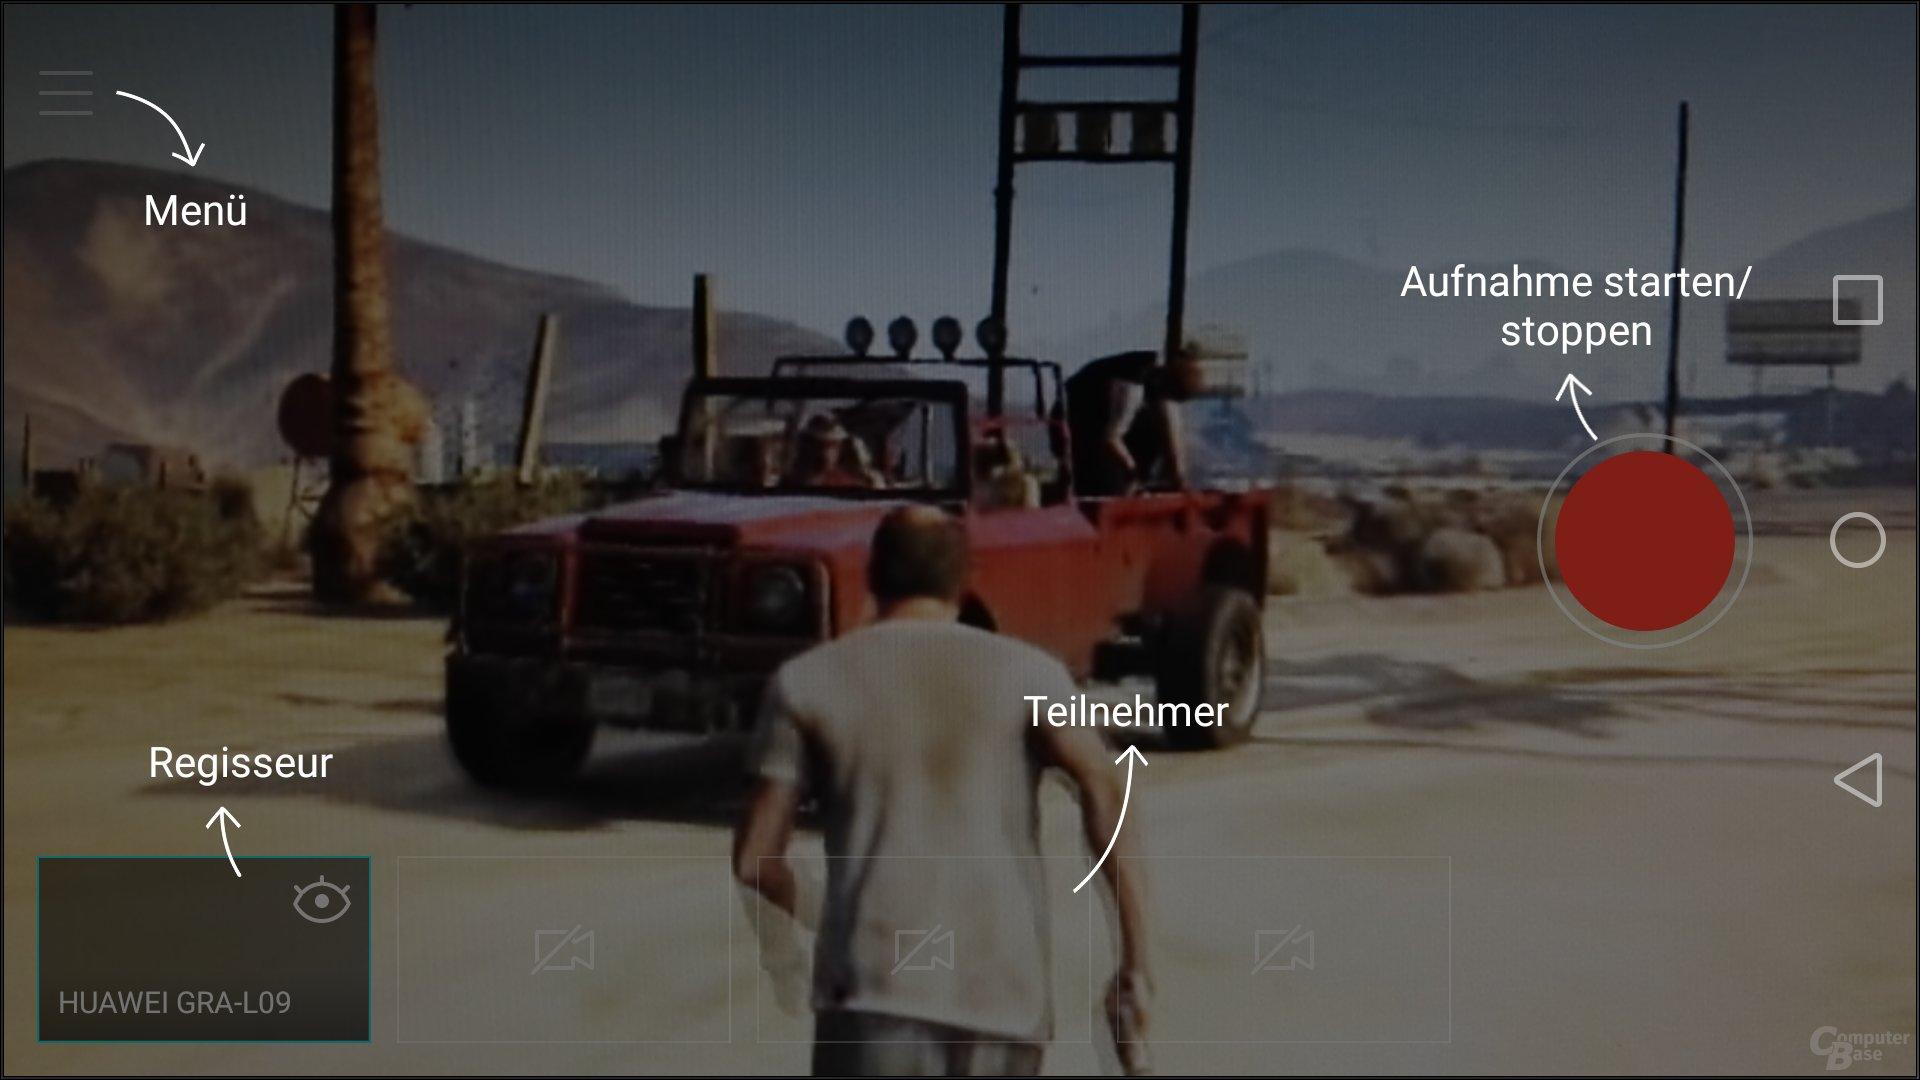 Regisseur-Modus – Startbildschirm